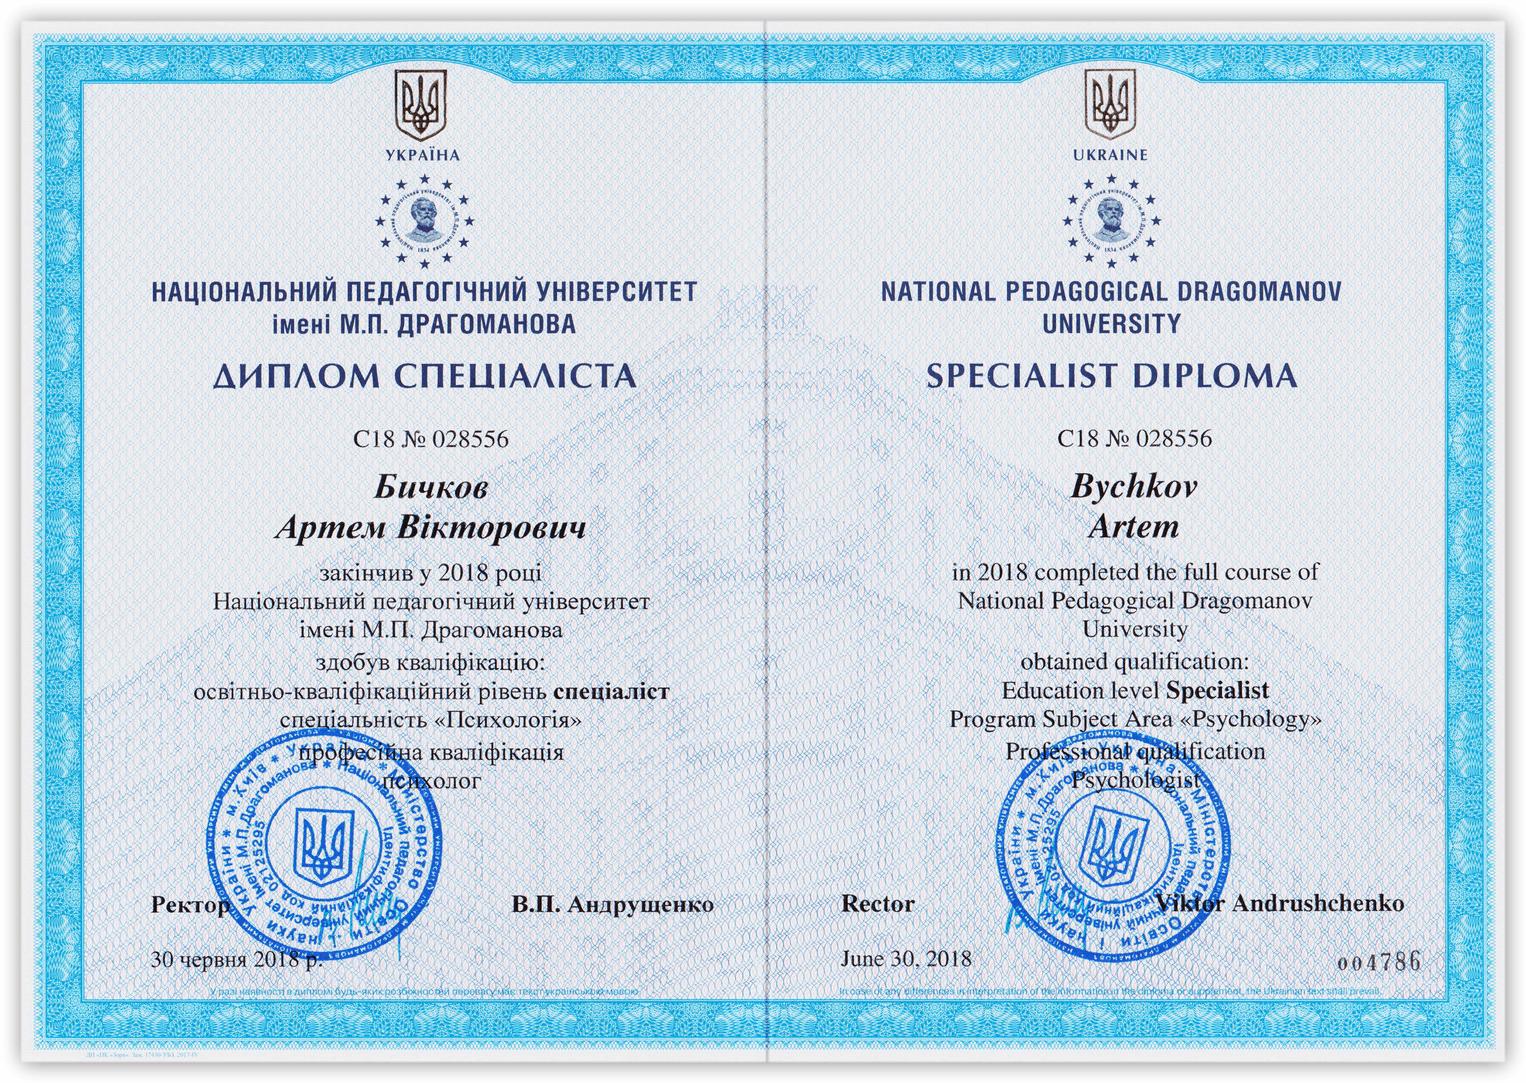 Диплом психолога Артём Бычков